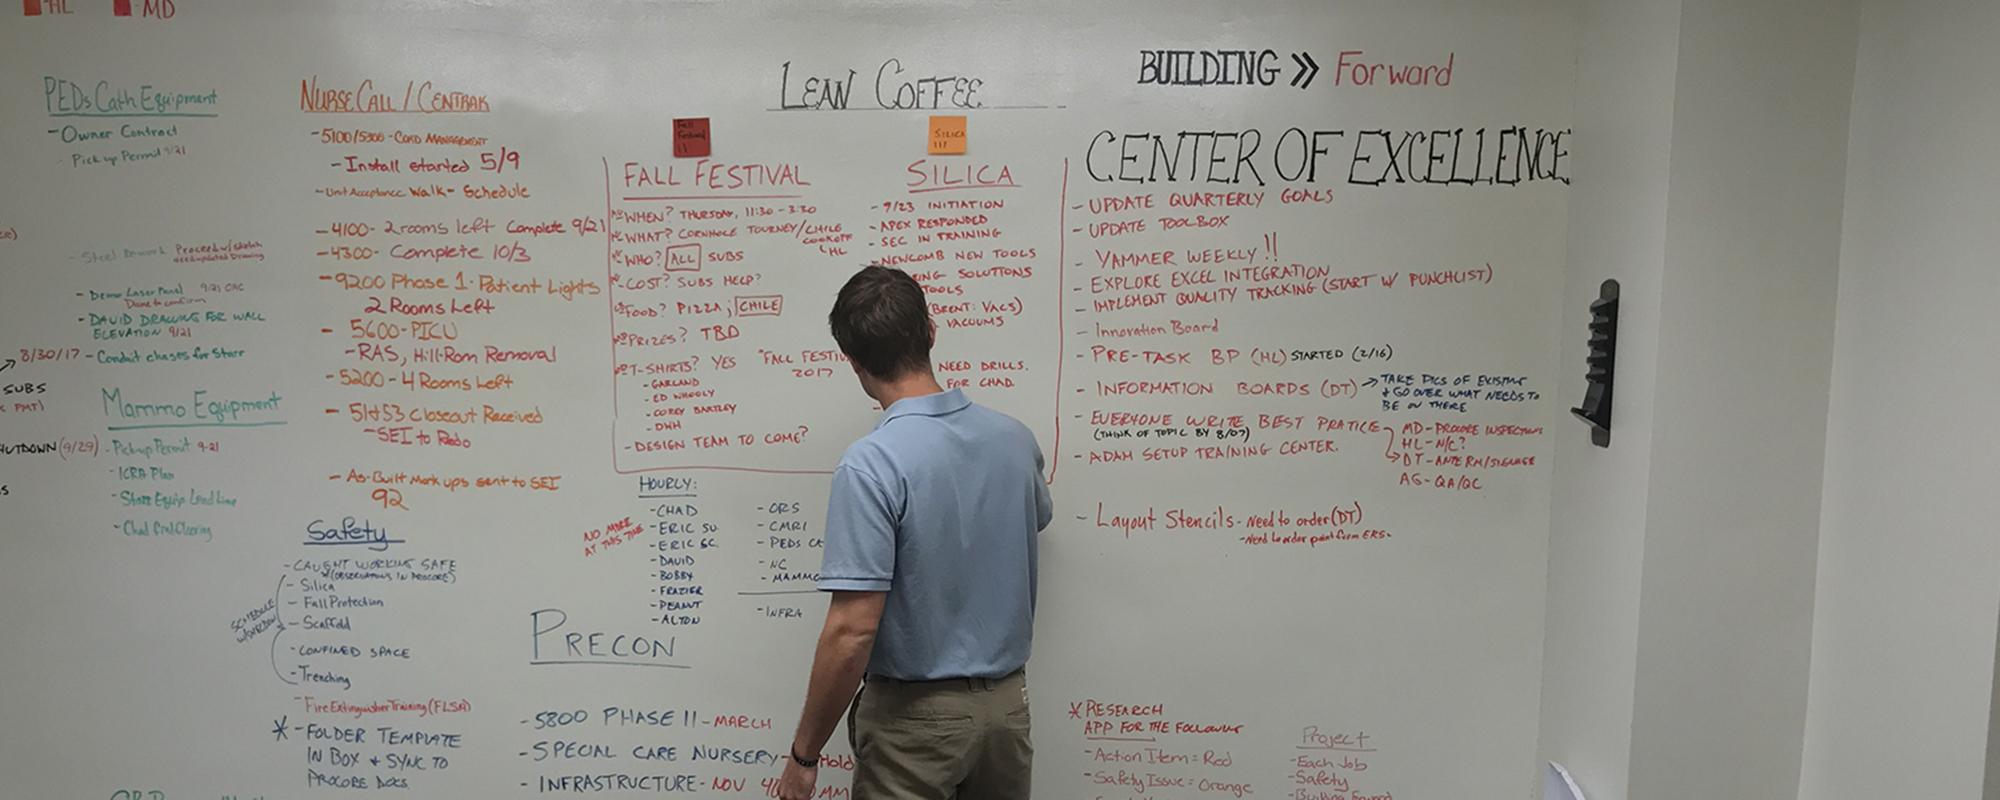 Robins & Morton employee leading team Lean Coffee